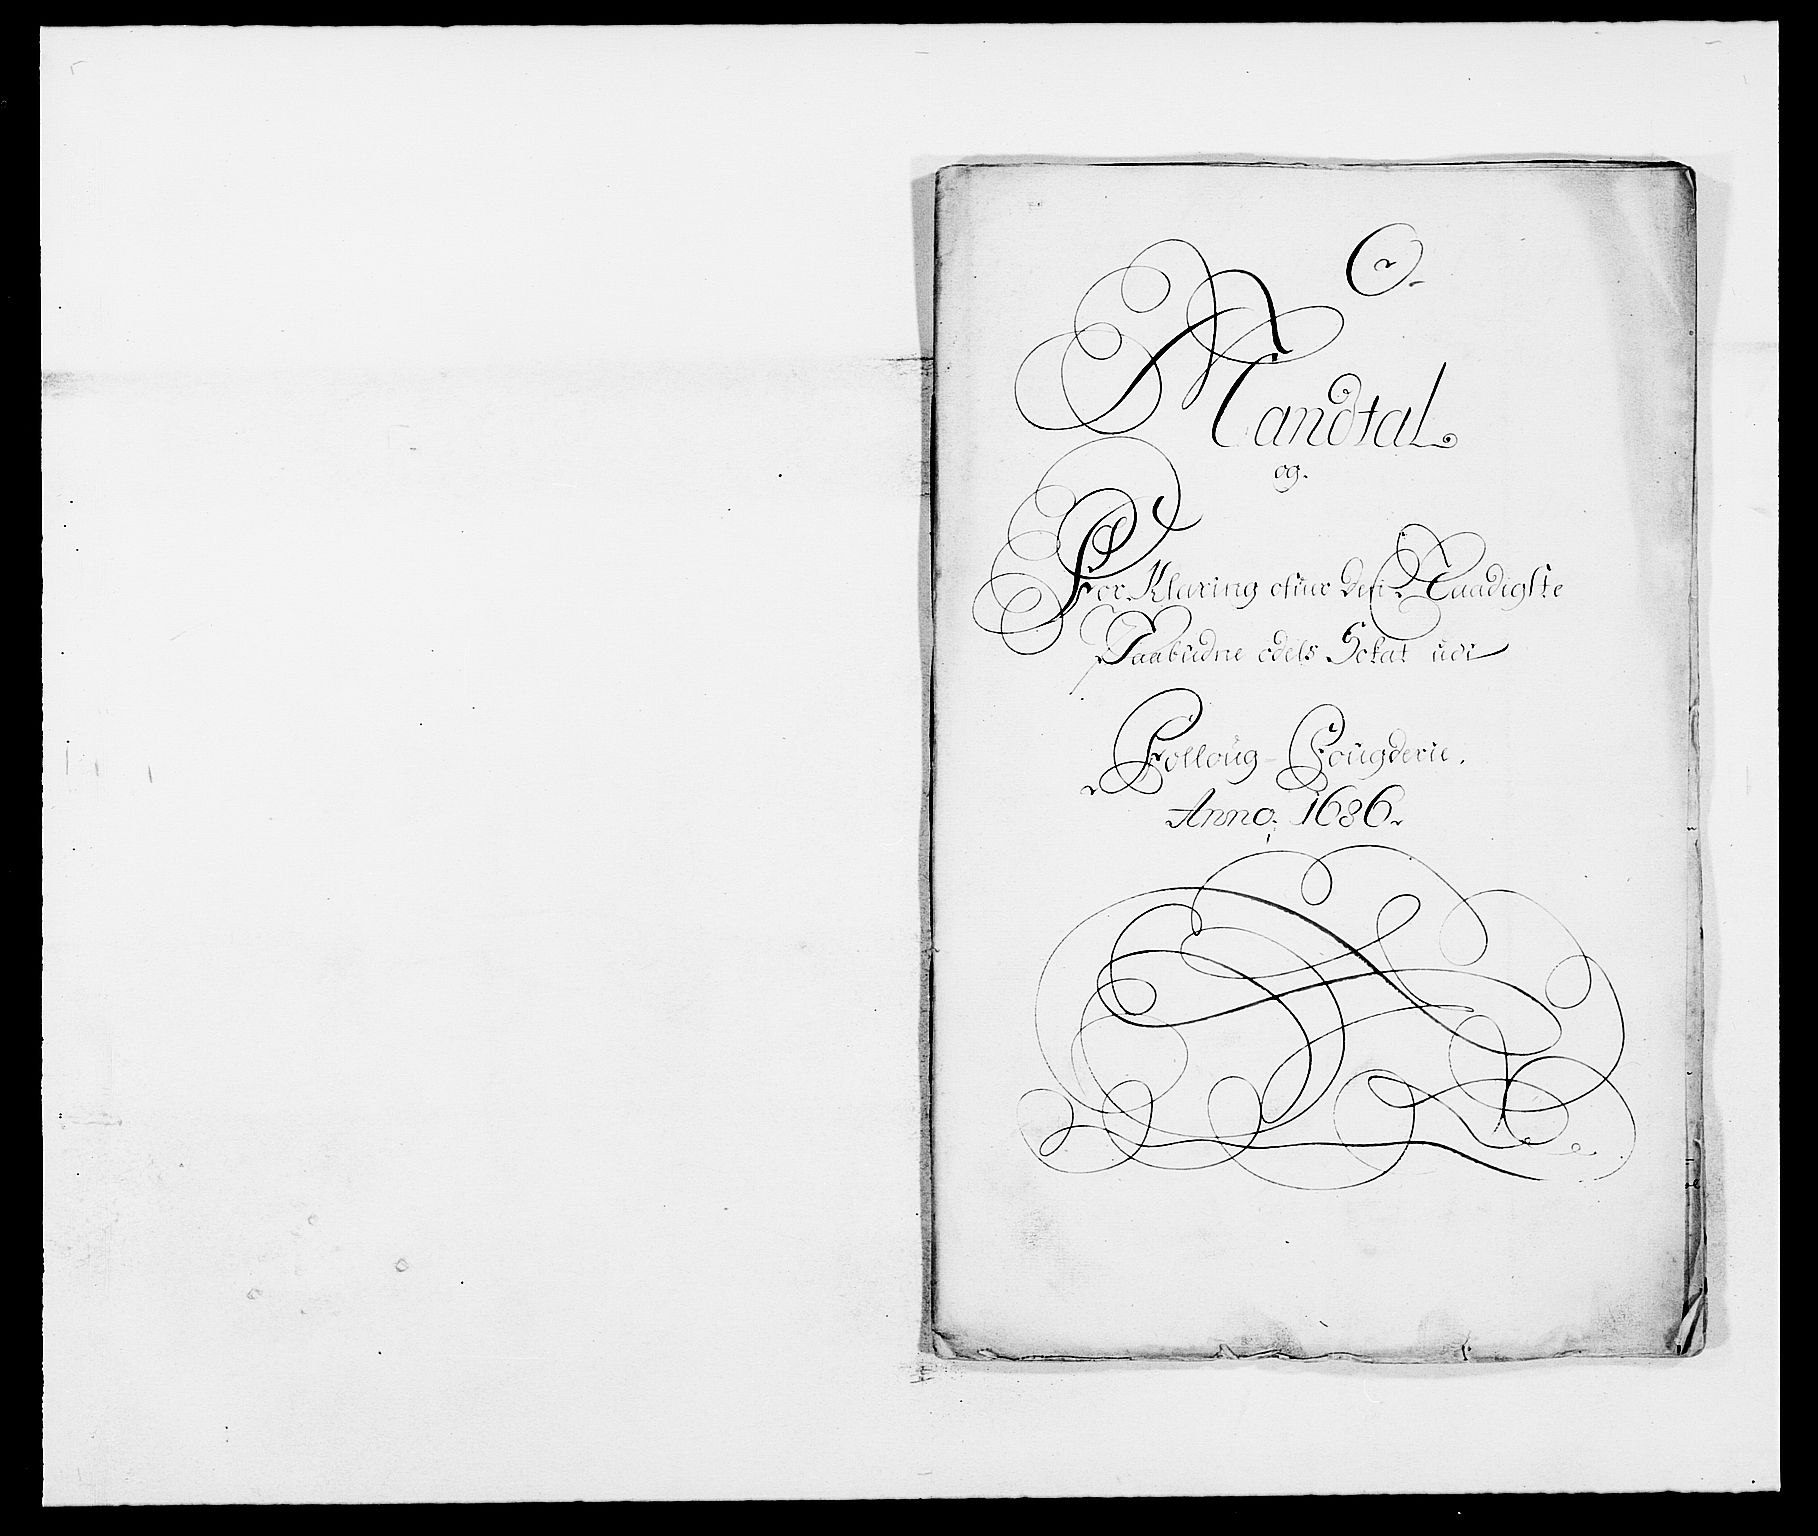 RA, Rentekammeret inntil 1814, Reviderte regnskaper, Fogderegnskap, R09/L0433: Fogderegnskap Follo, 1685-1686, s. 383